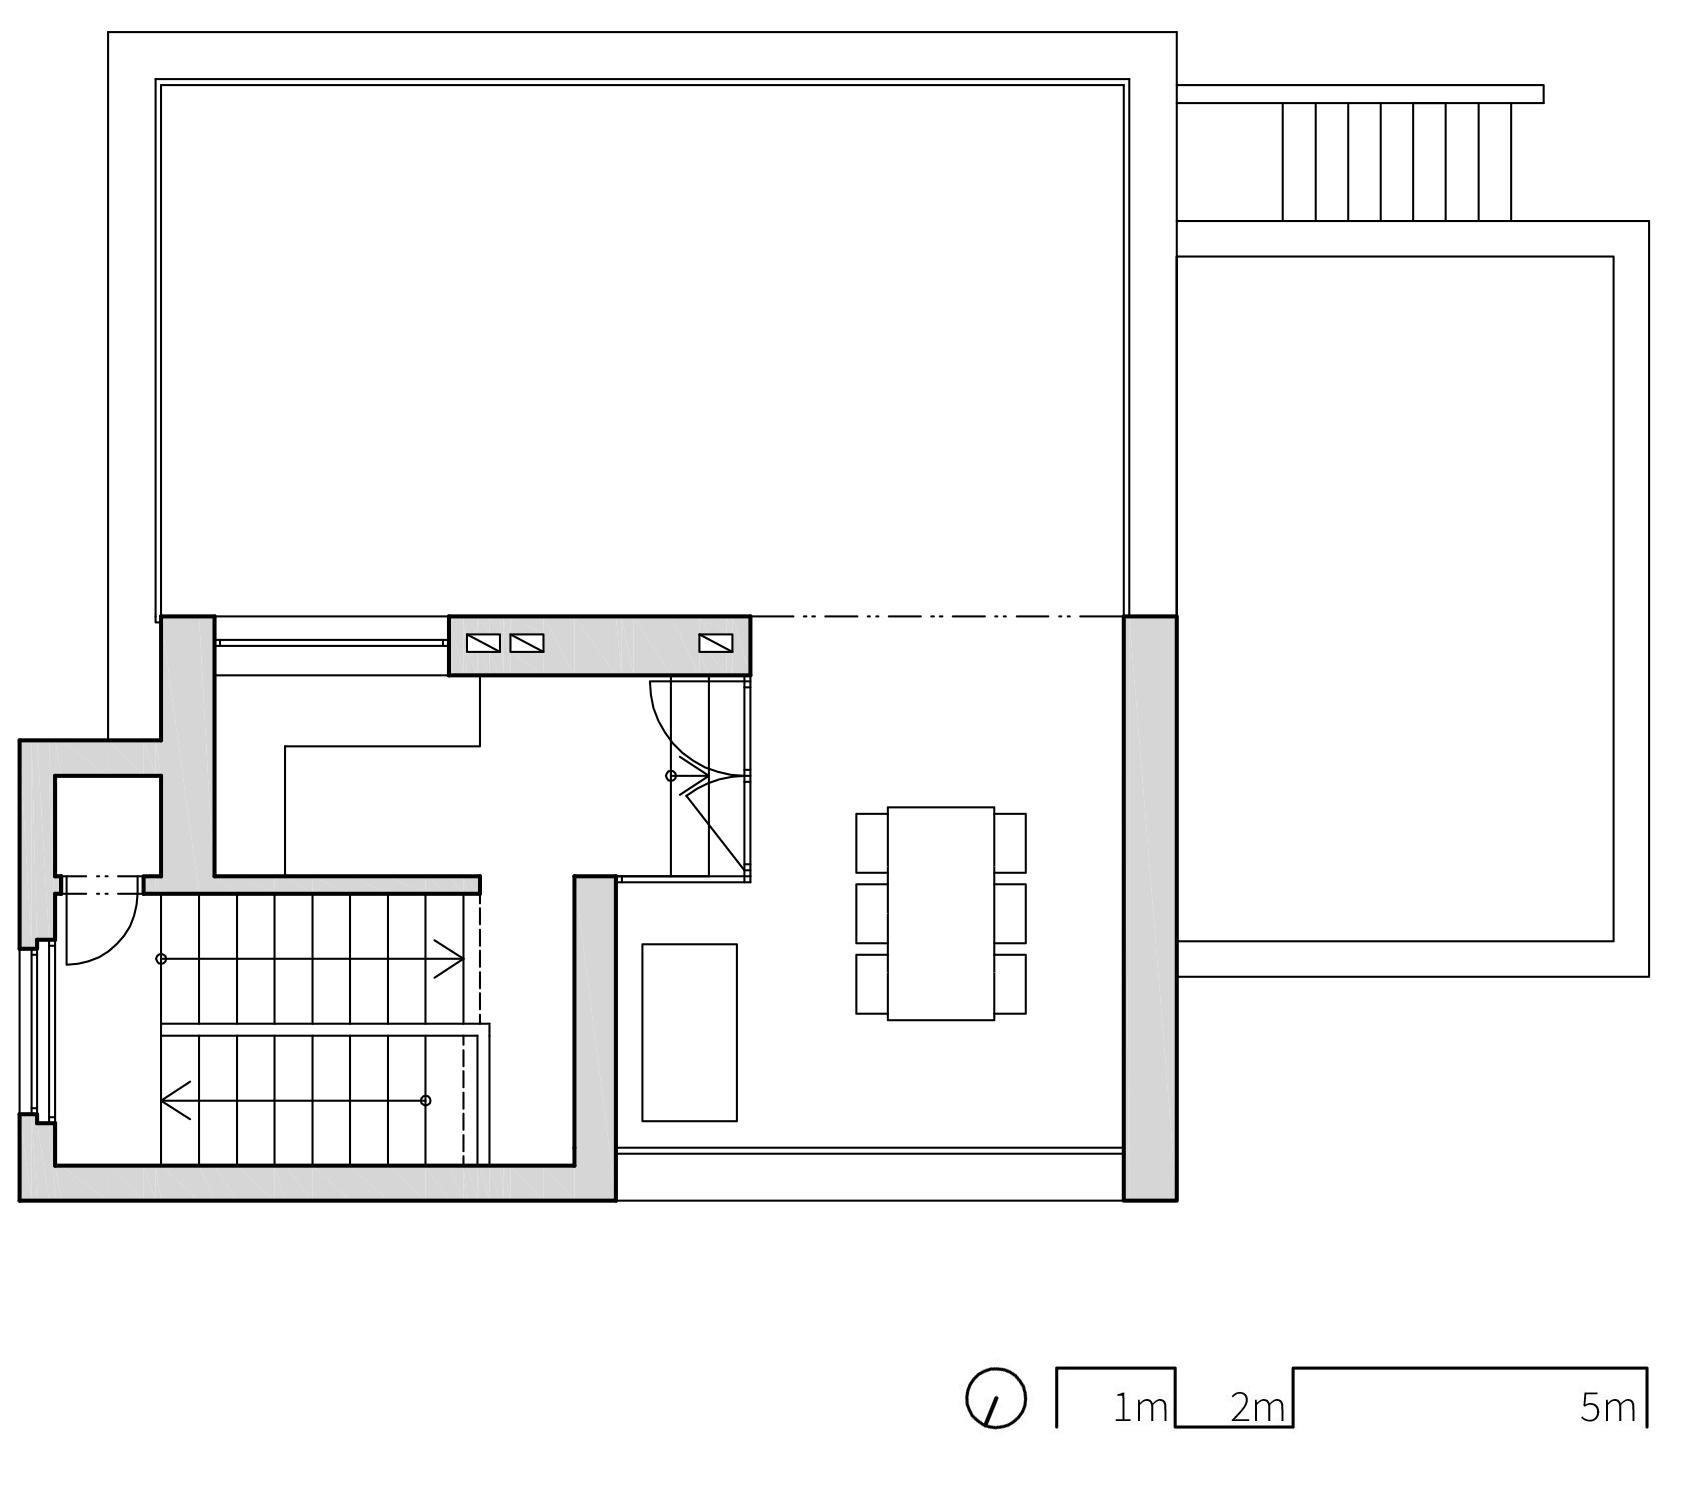 06-3NP-2560-2